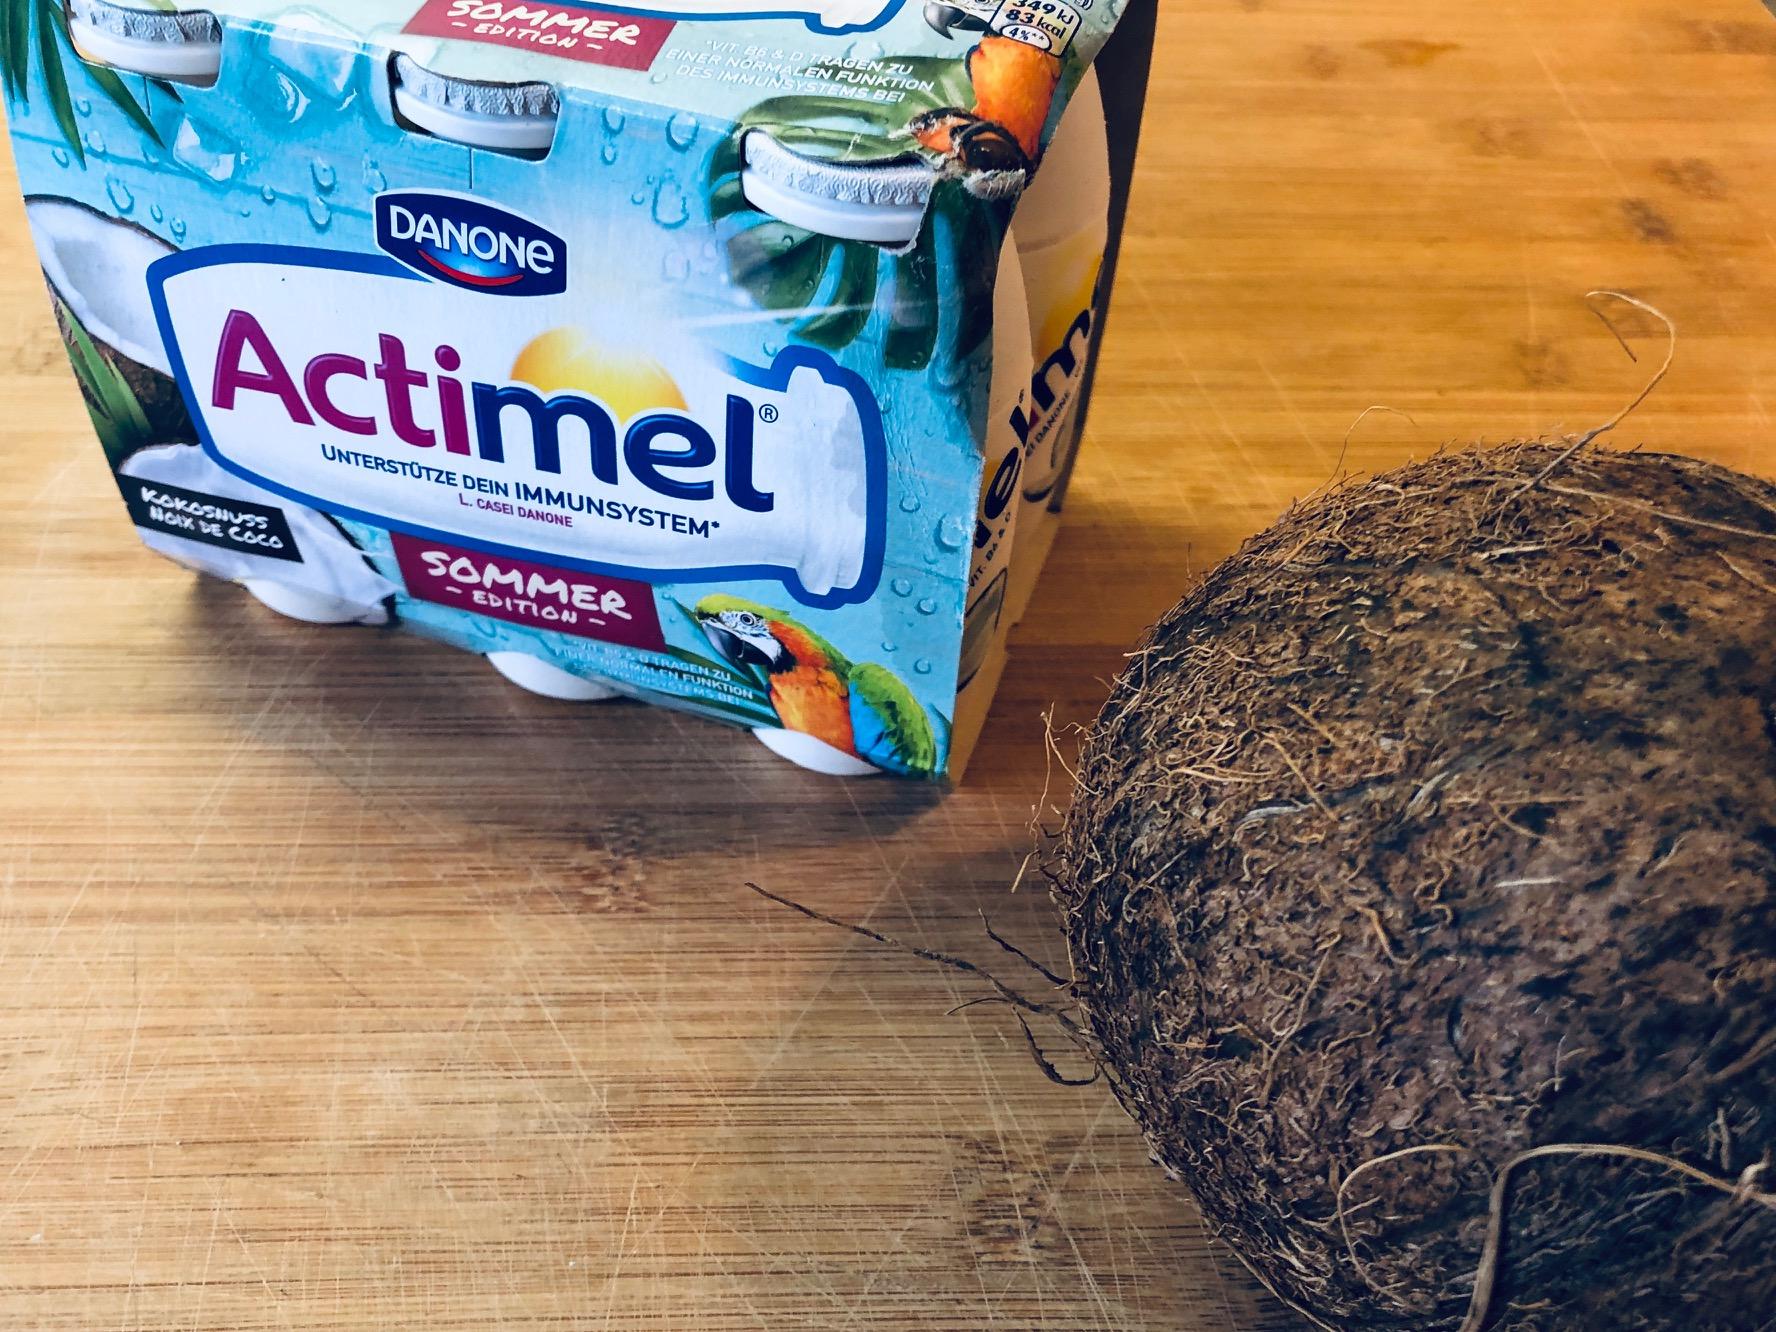 Danone-Actimel-Kokosnuss